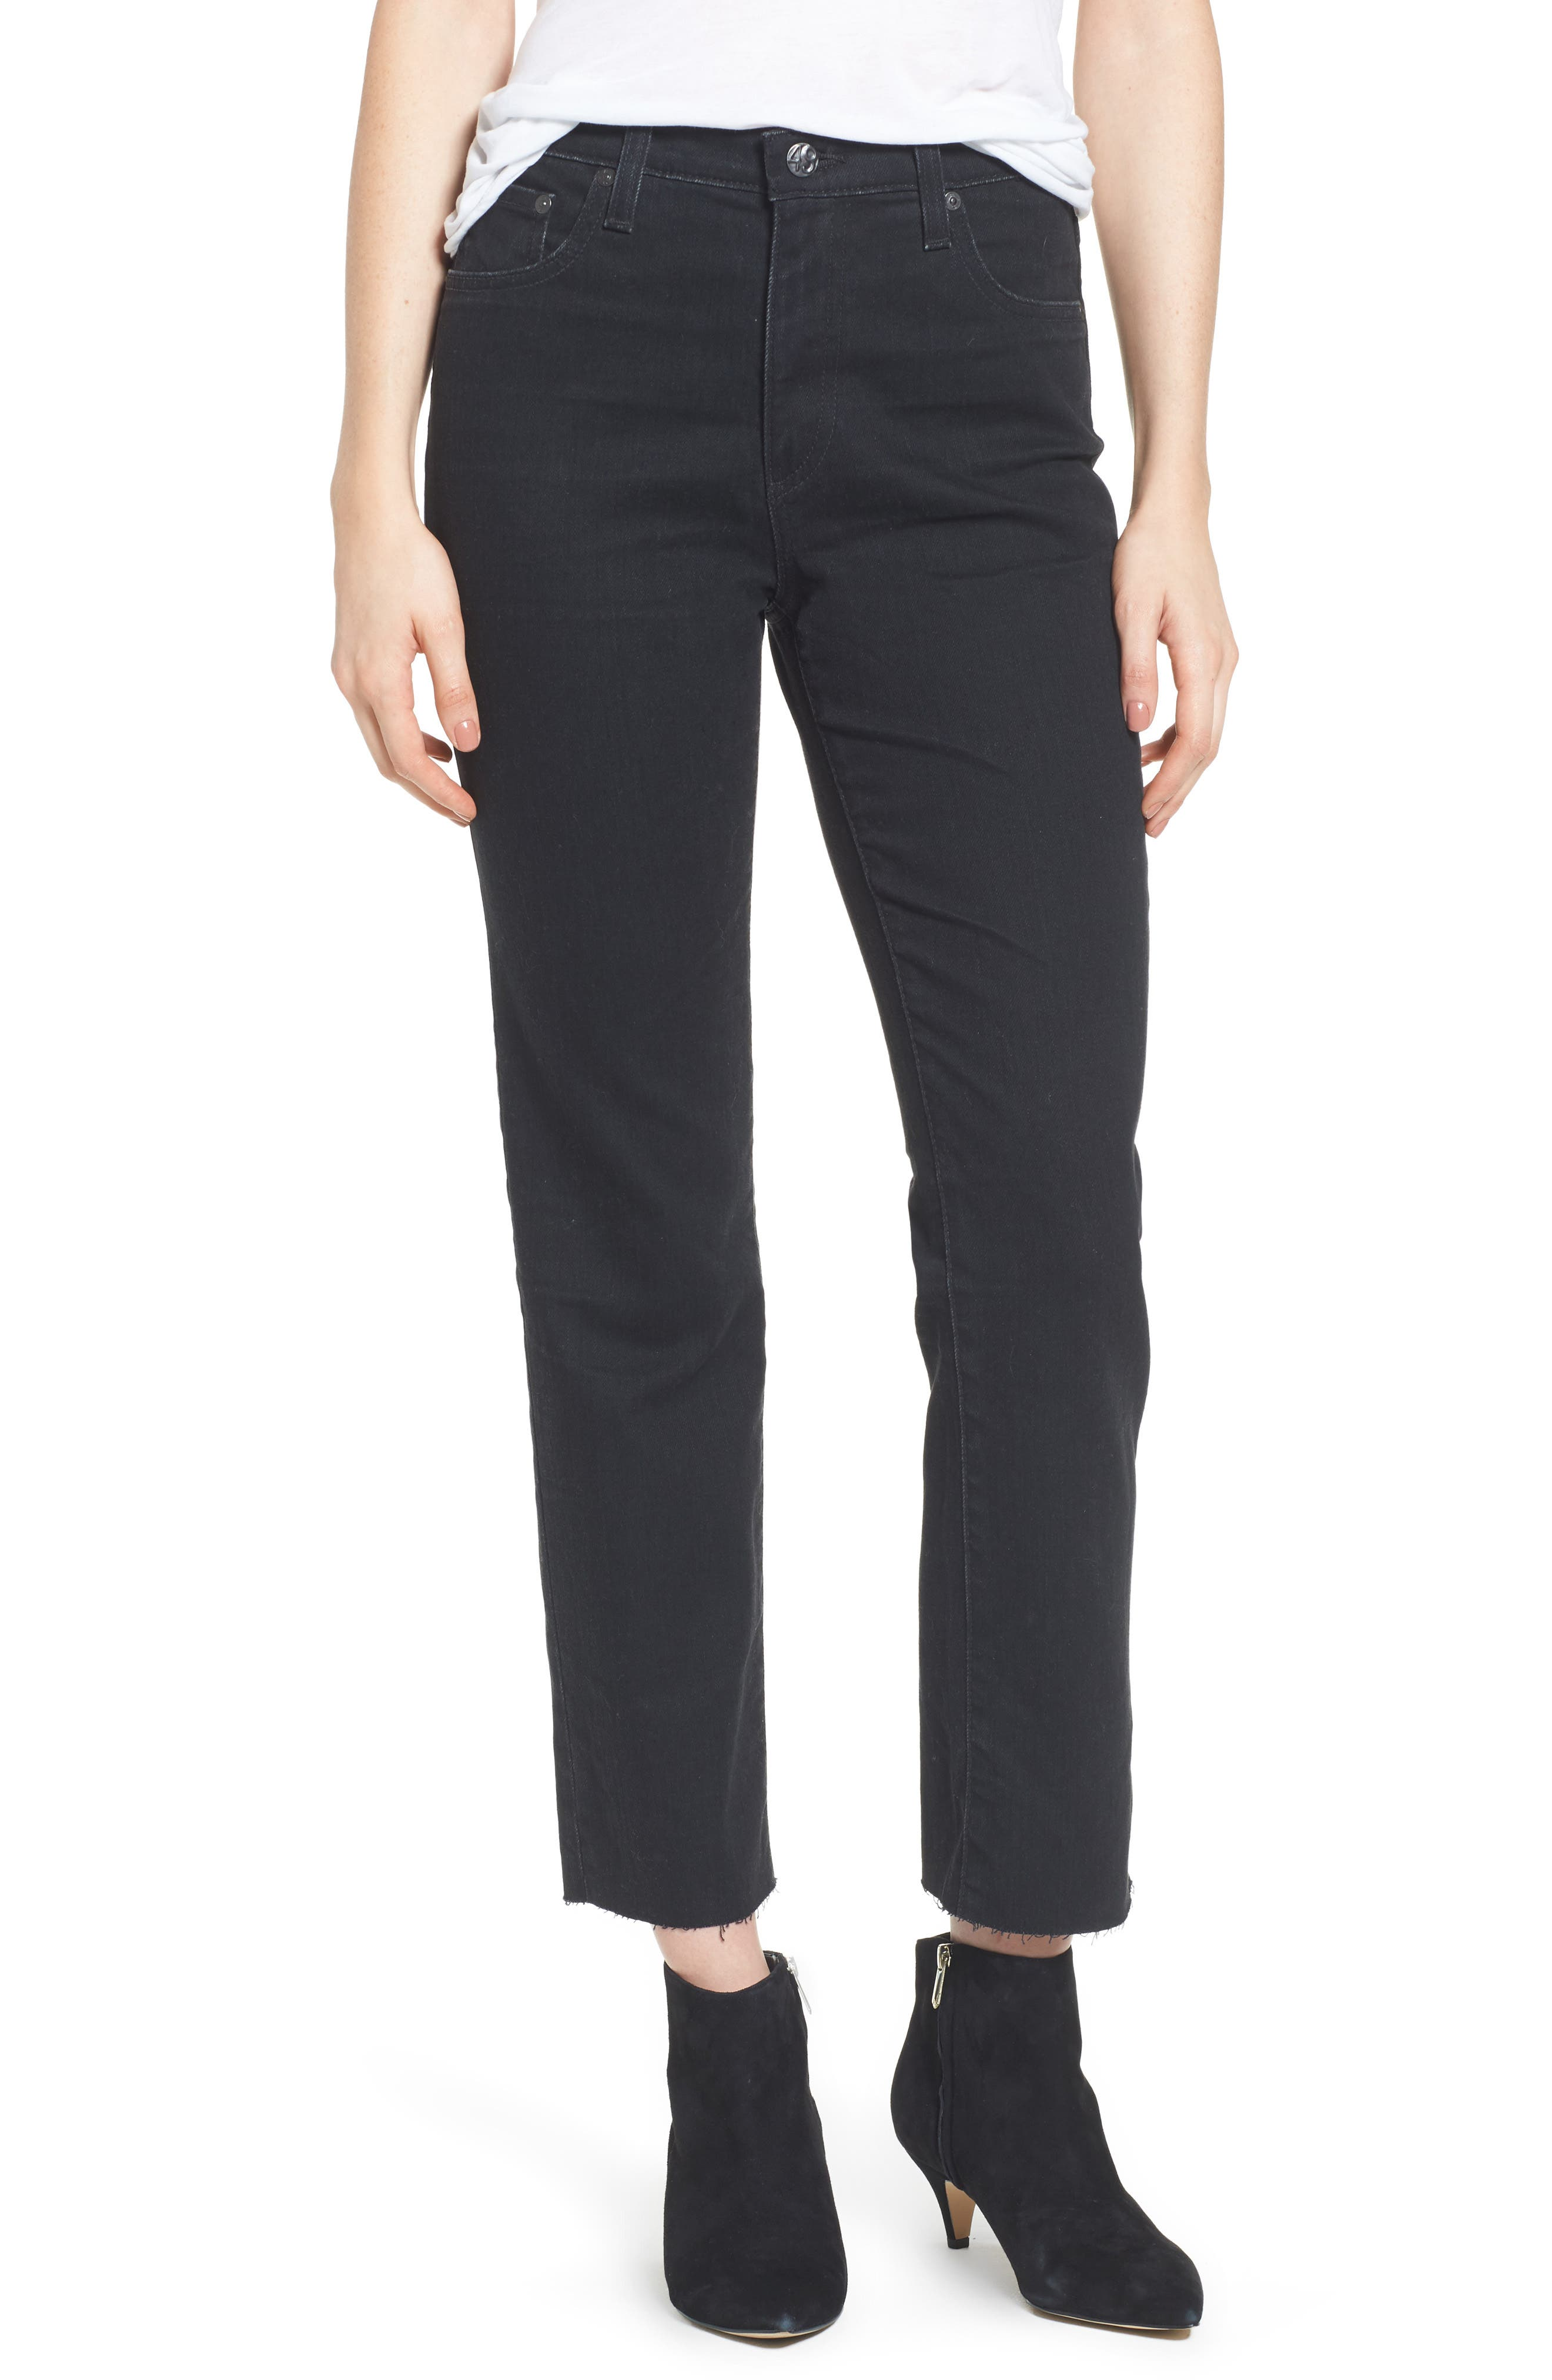 The Isabelle High Waist Crop Straight Leg Jeans,                             Main thumbnail 1, color,                             1 Year Black Hawk